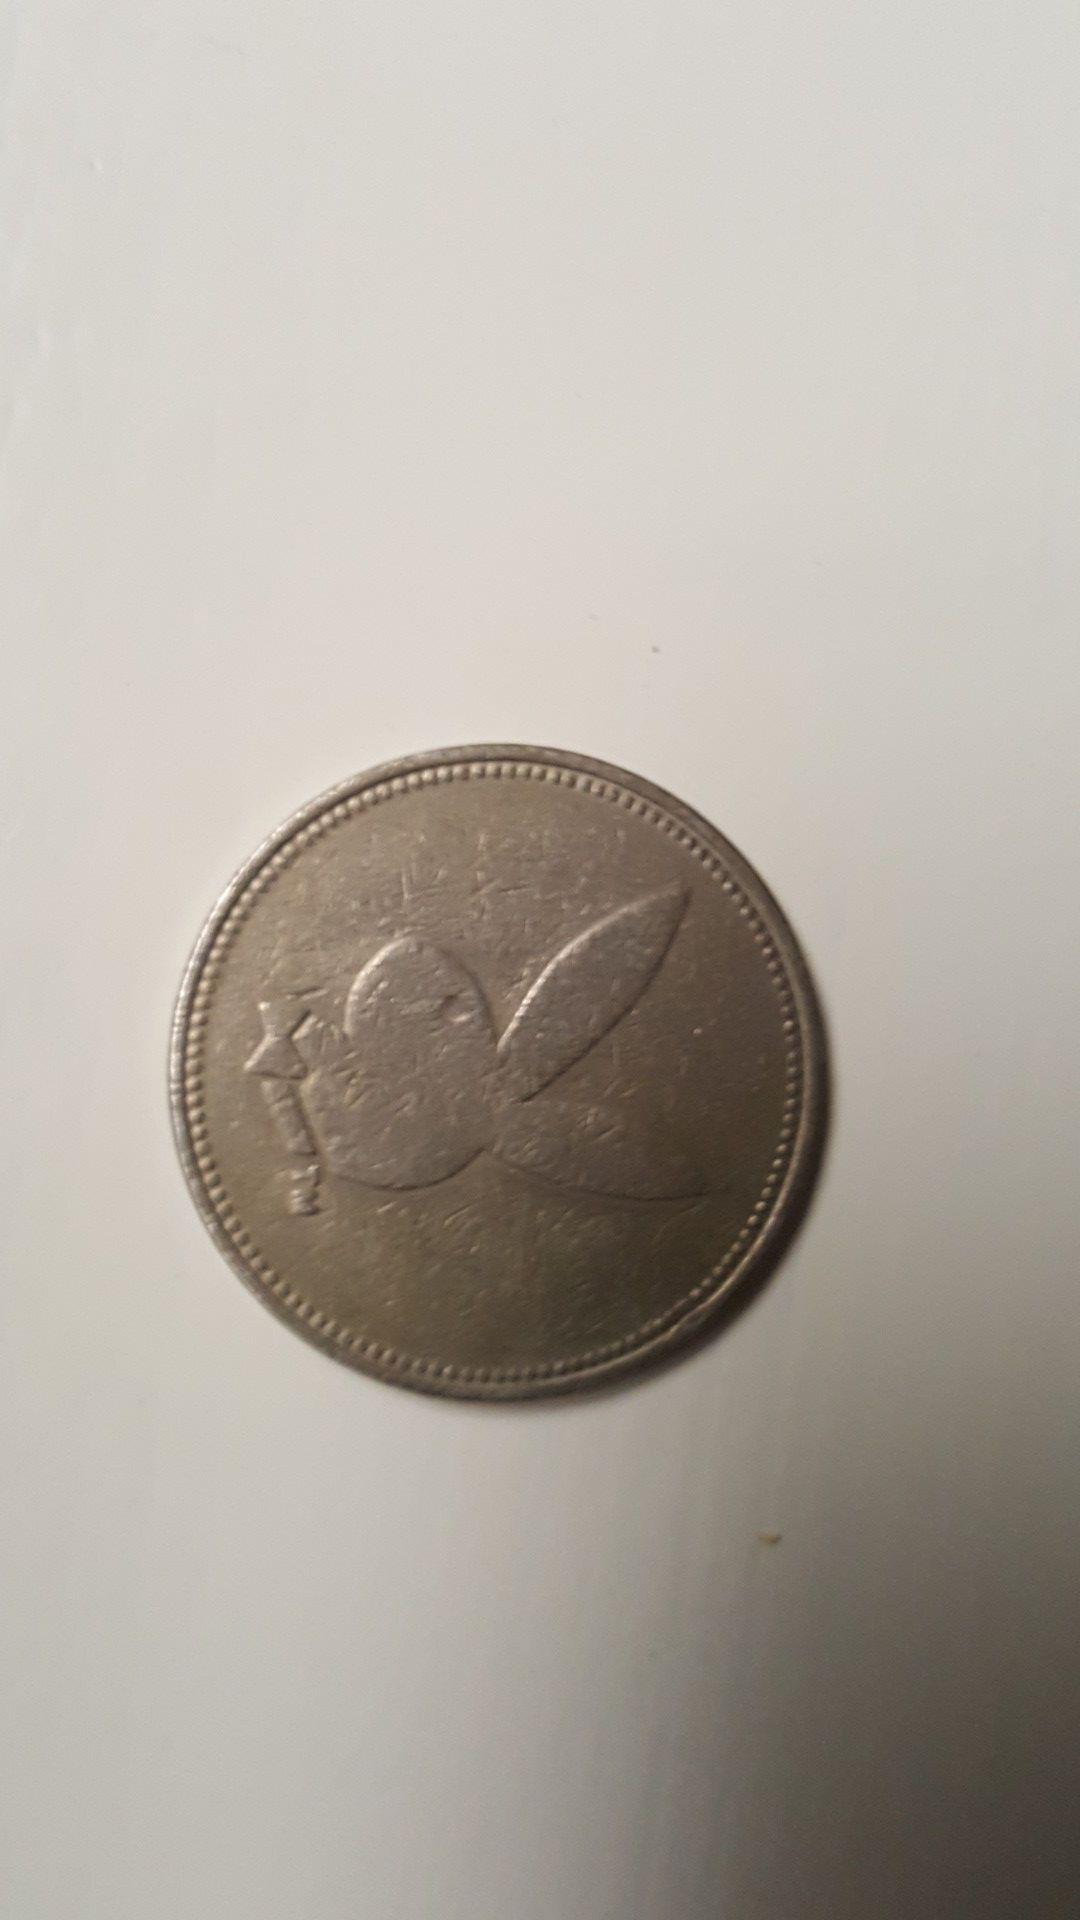 1.00 token